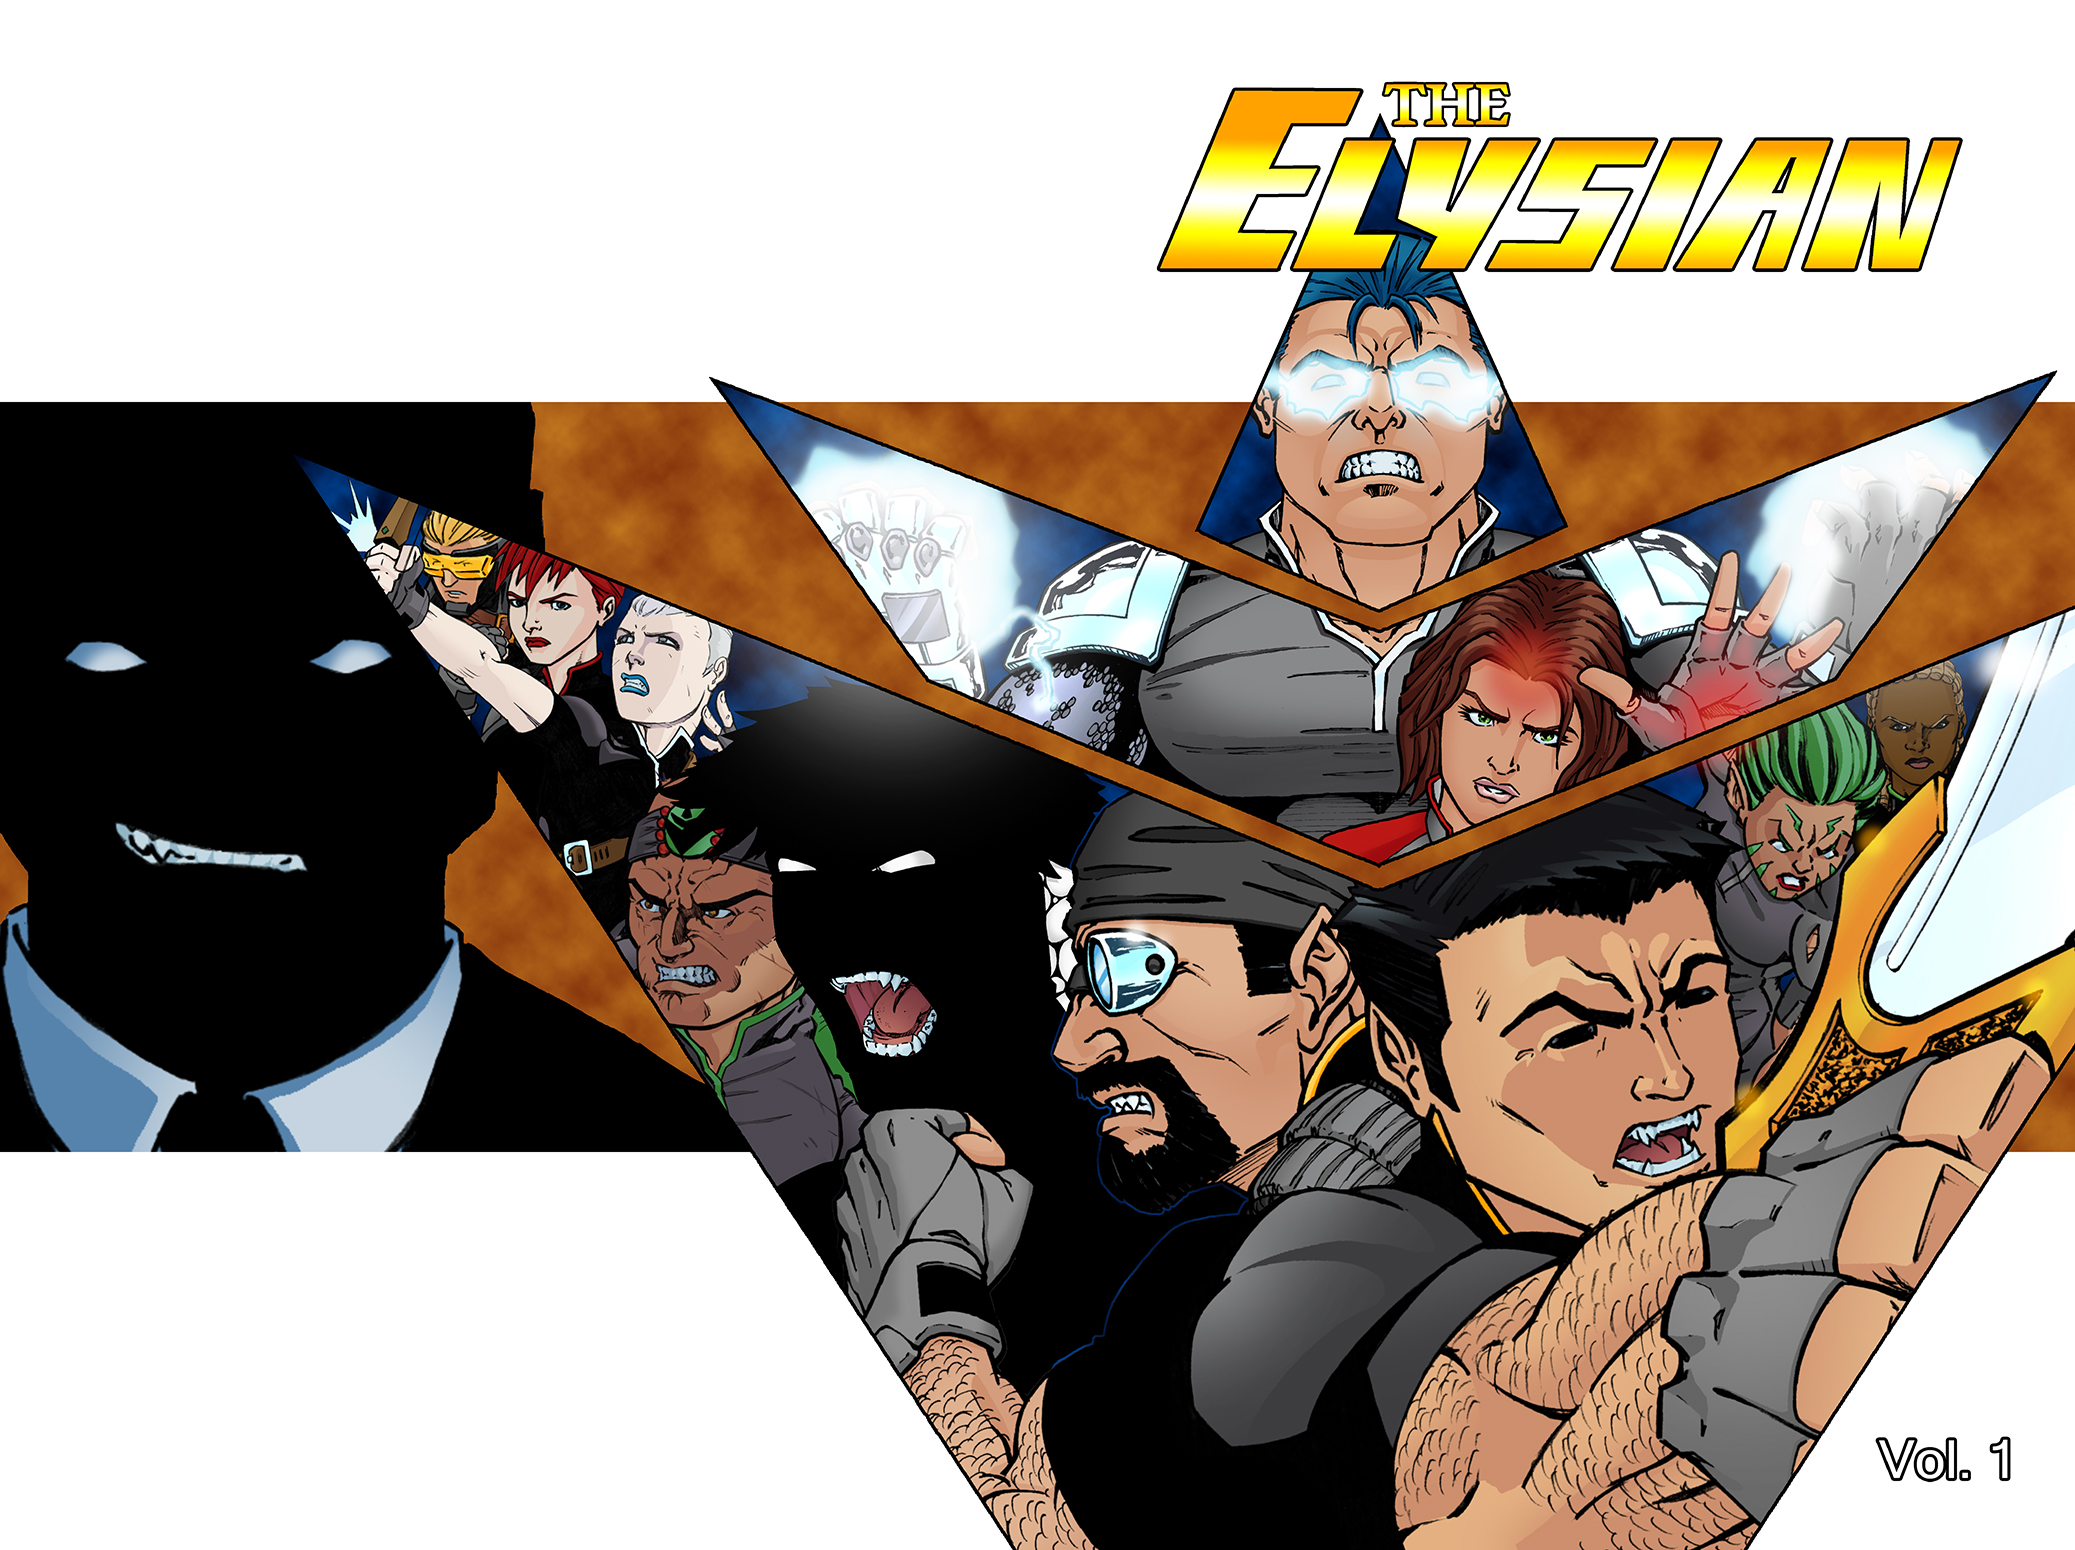 The Elysian Vol. 1 cover